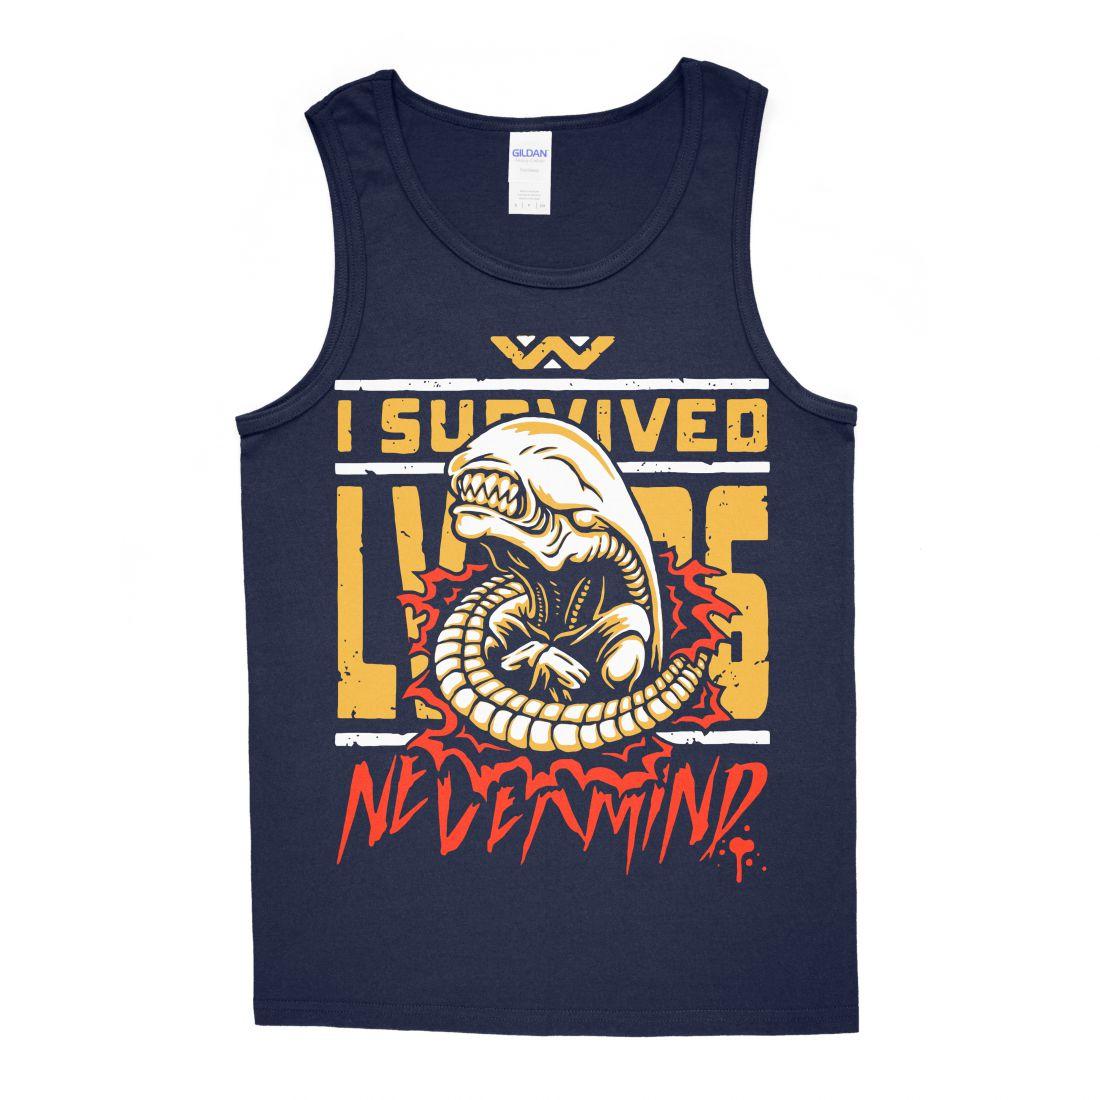 Survived LV 426 (navy blue trikó)